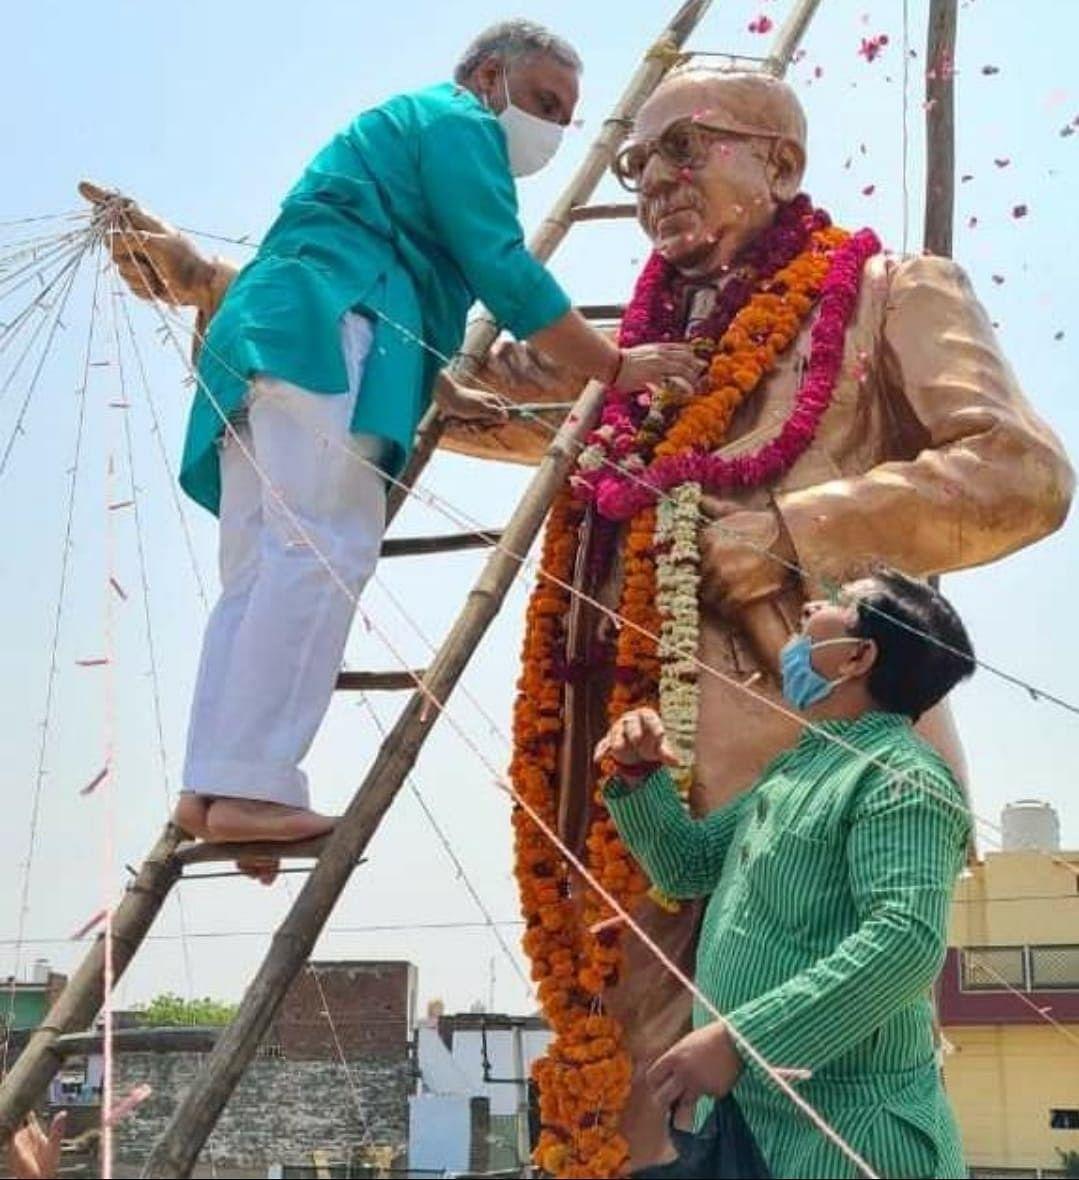 ambedkar-ji-gave-a-new-direction-to-the-society-karmaveer-singh